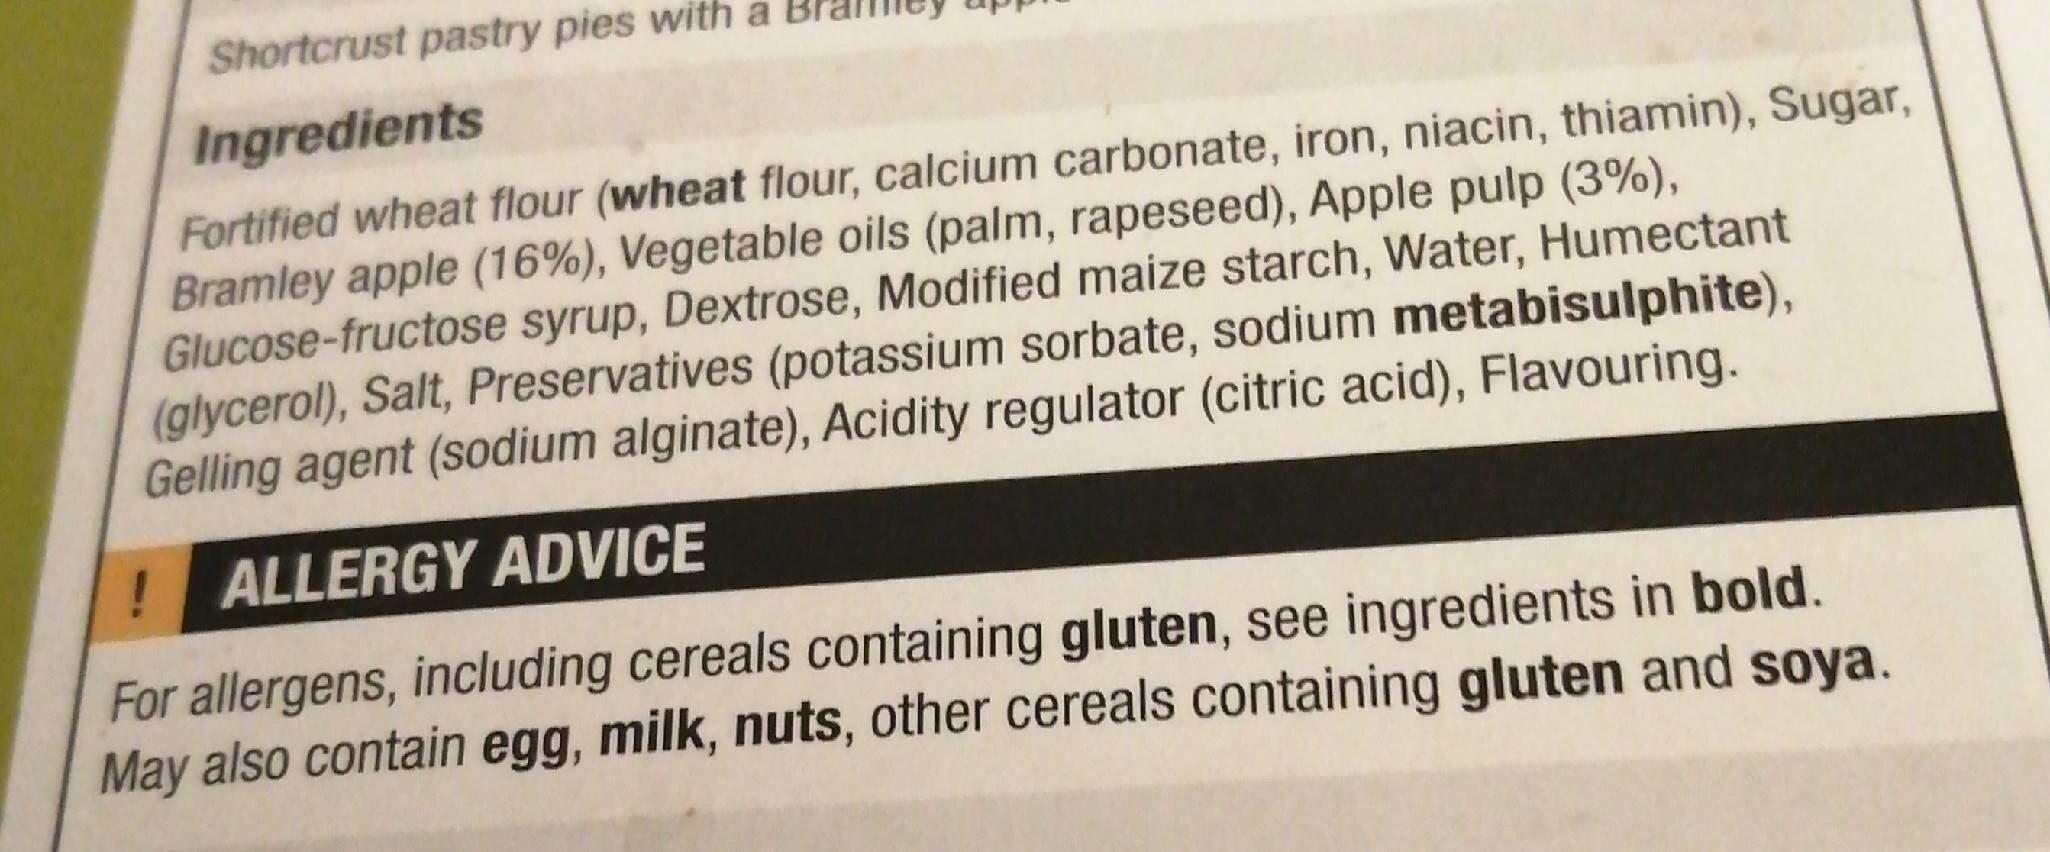 6 Brambley Apple Pies - Nutrition facts - en